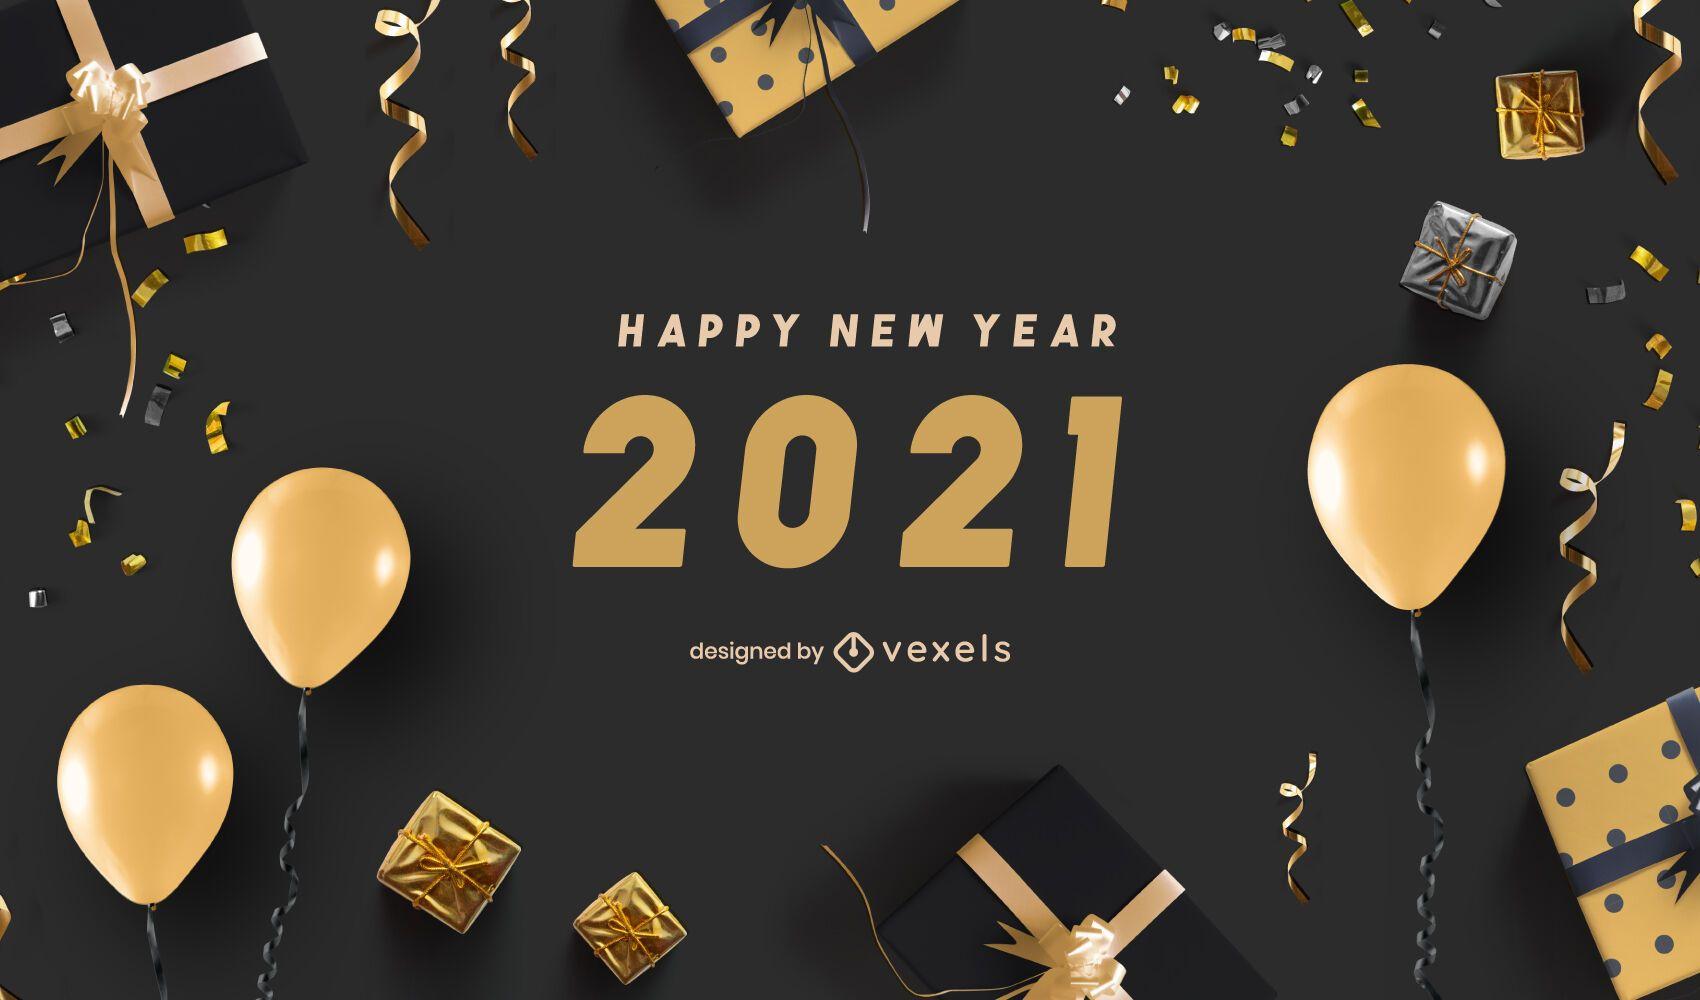 Happy new year 2021 background design